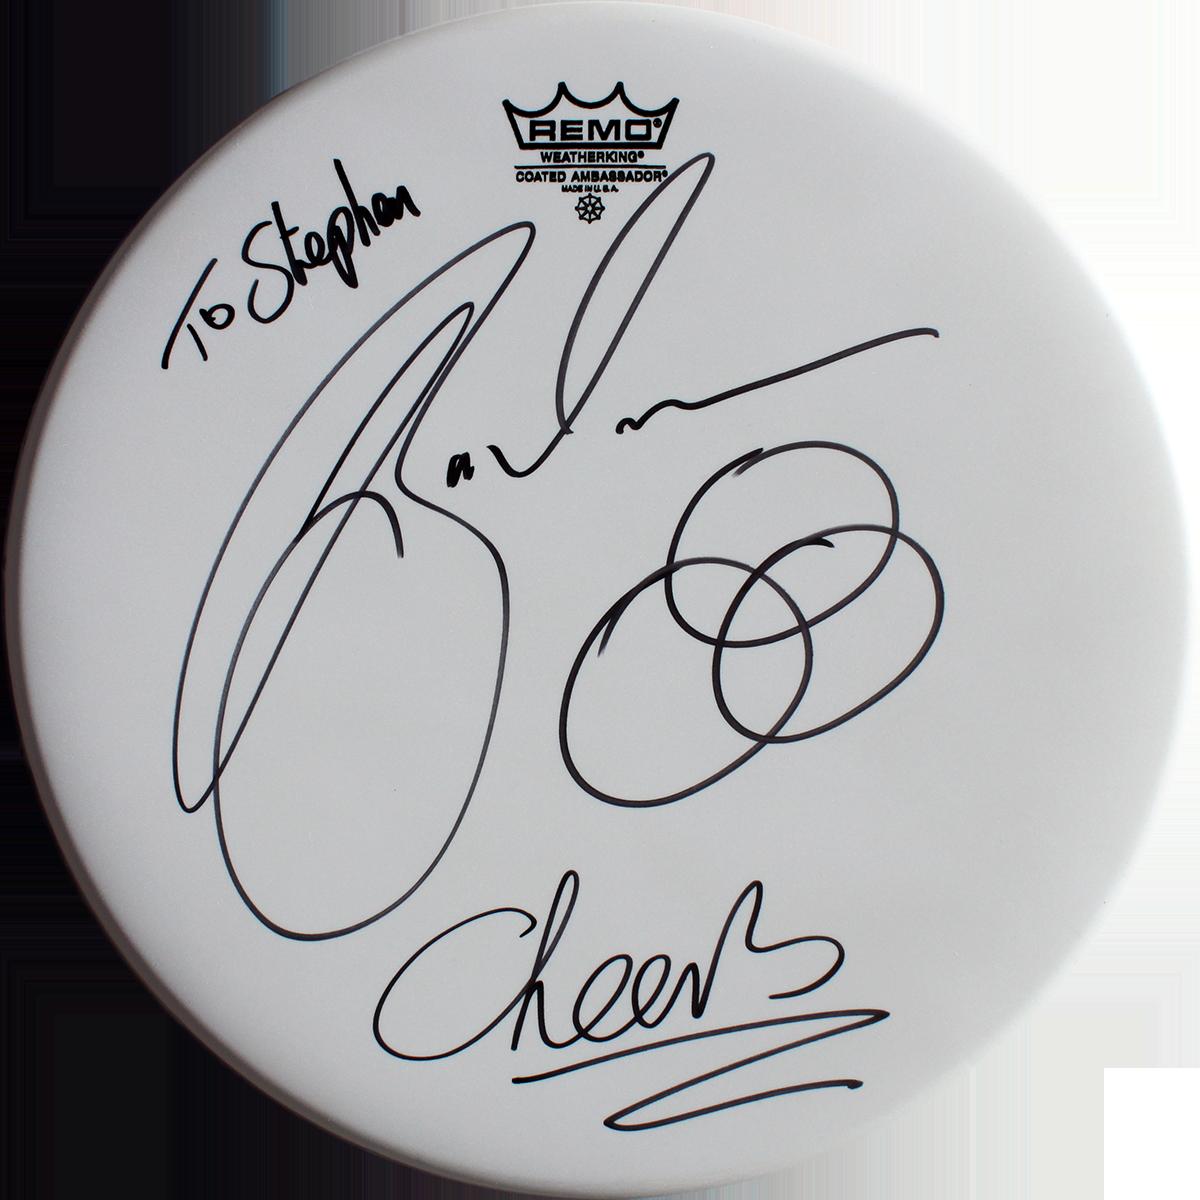 Jason Bonham Signed Drumhead